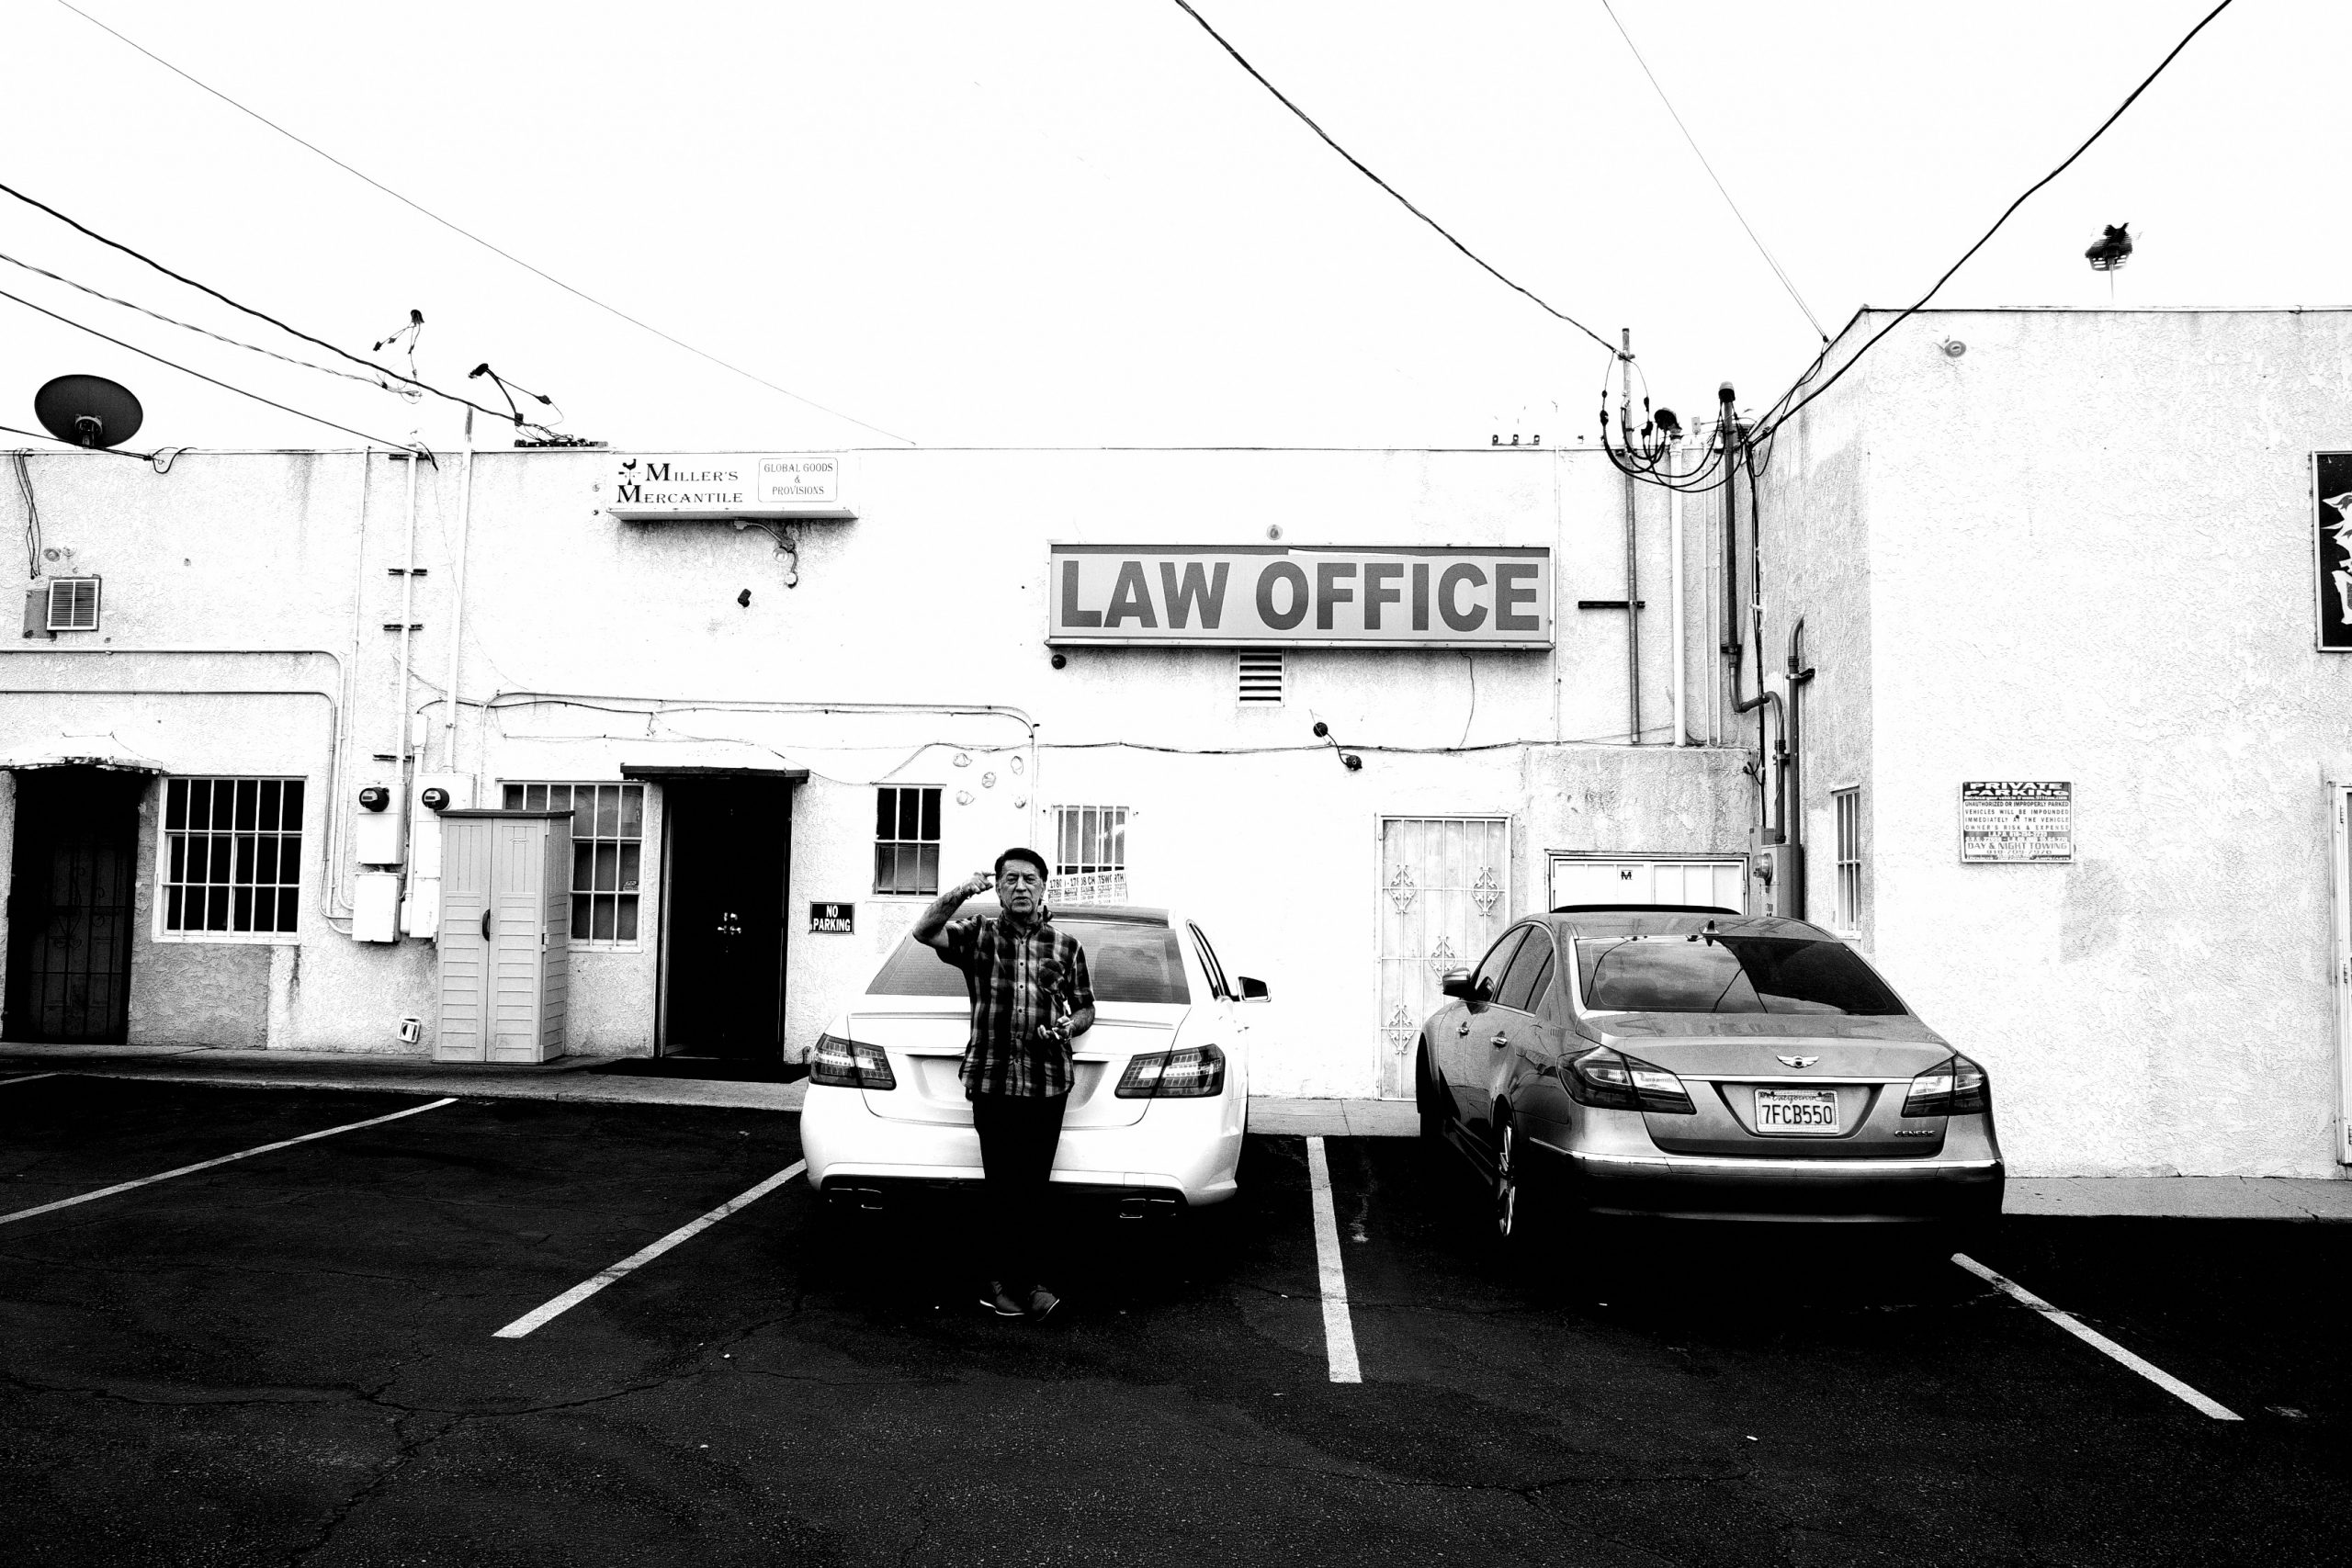 Los Angeles law office  street